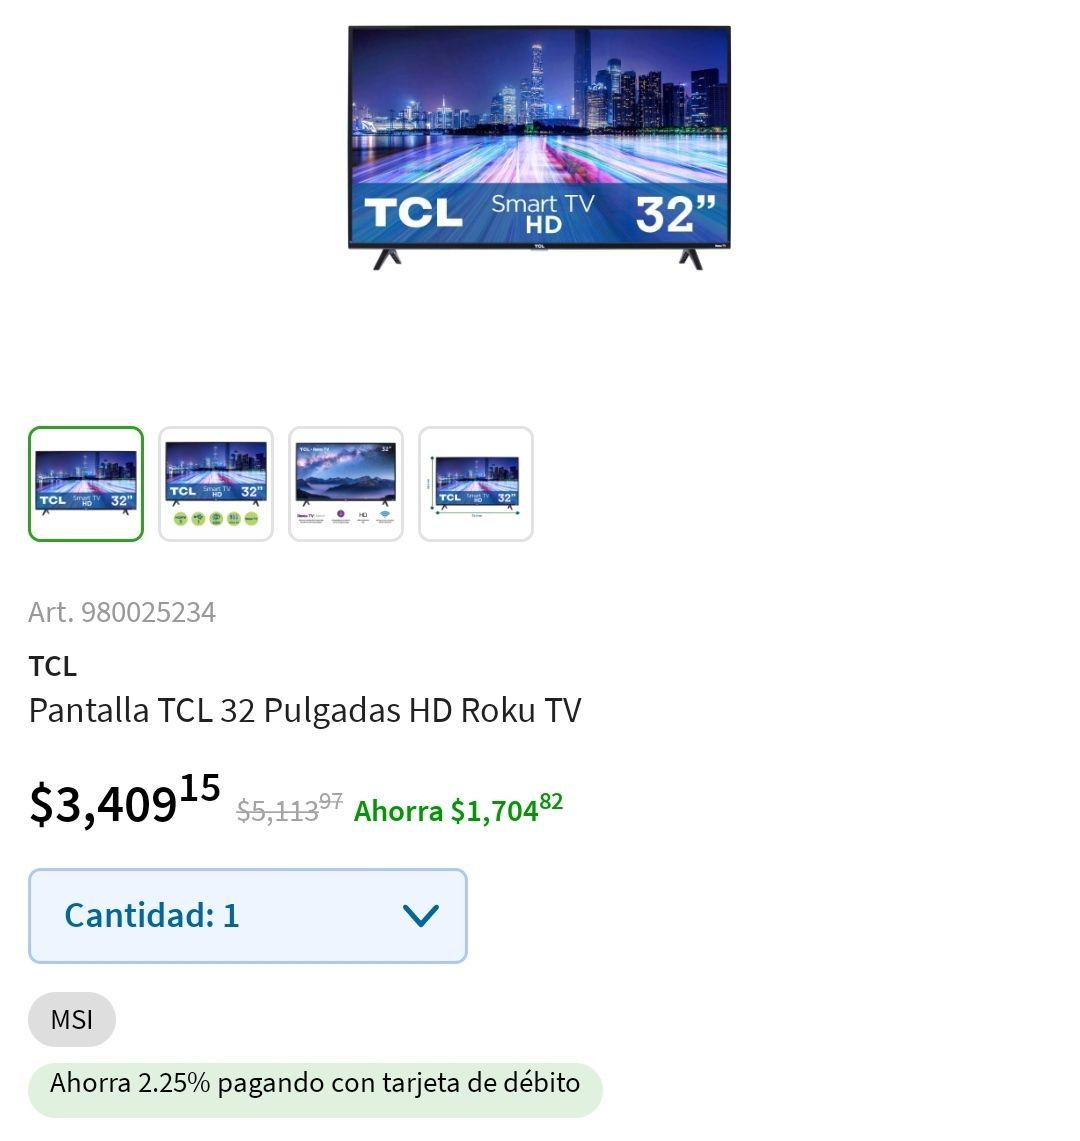 Sam's Club: Pantalla TCL 32 Pulgadas HD Roku TV